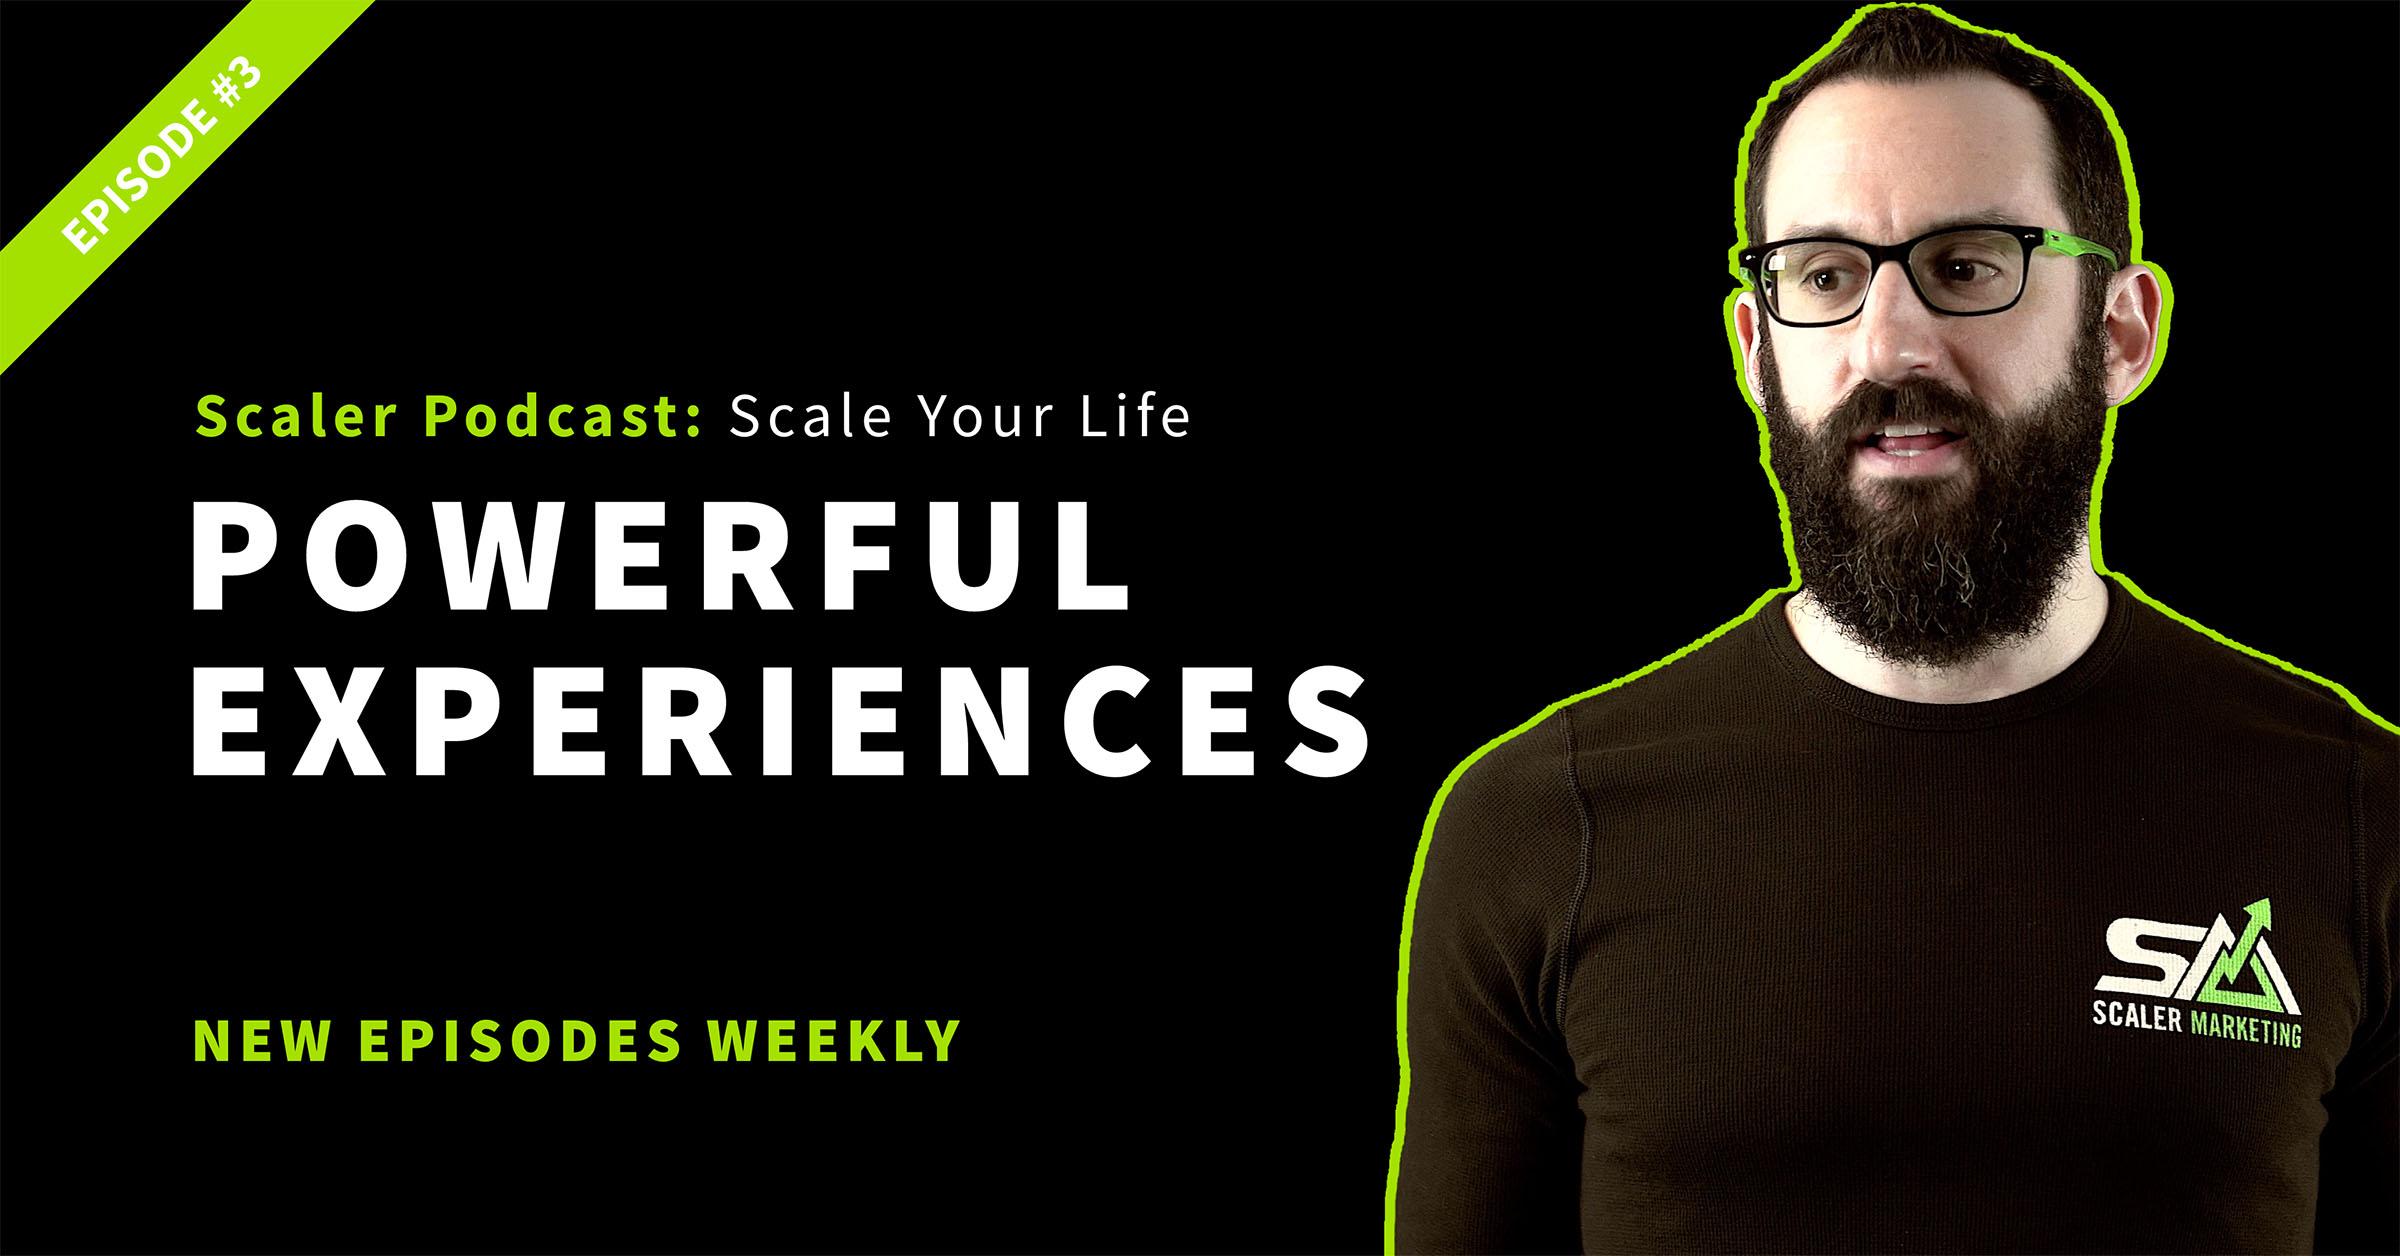 Episode 3 - Powerful Experiences